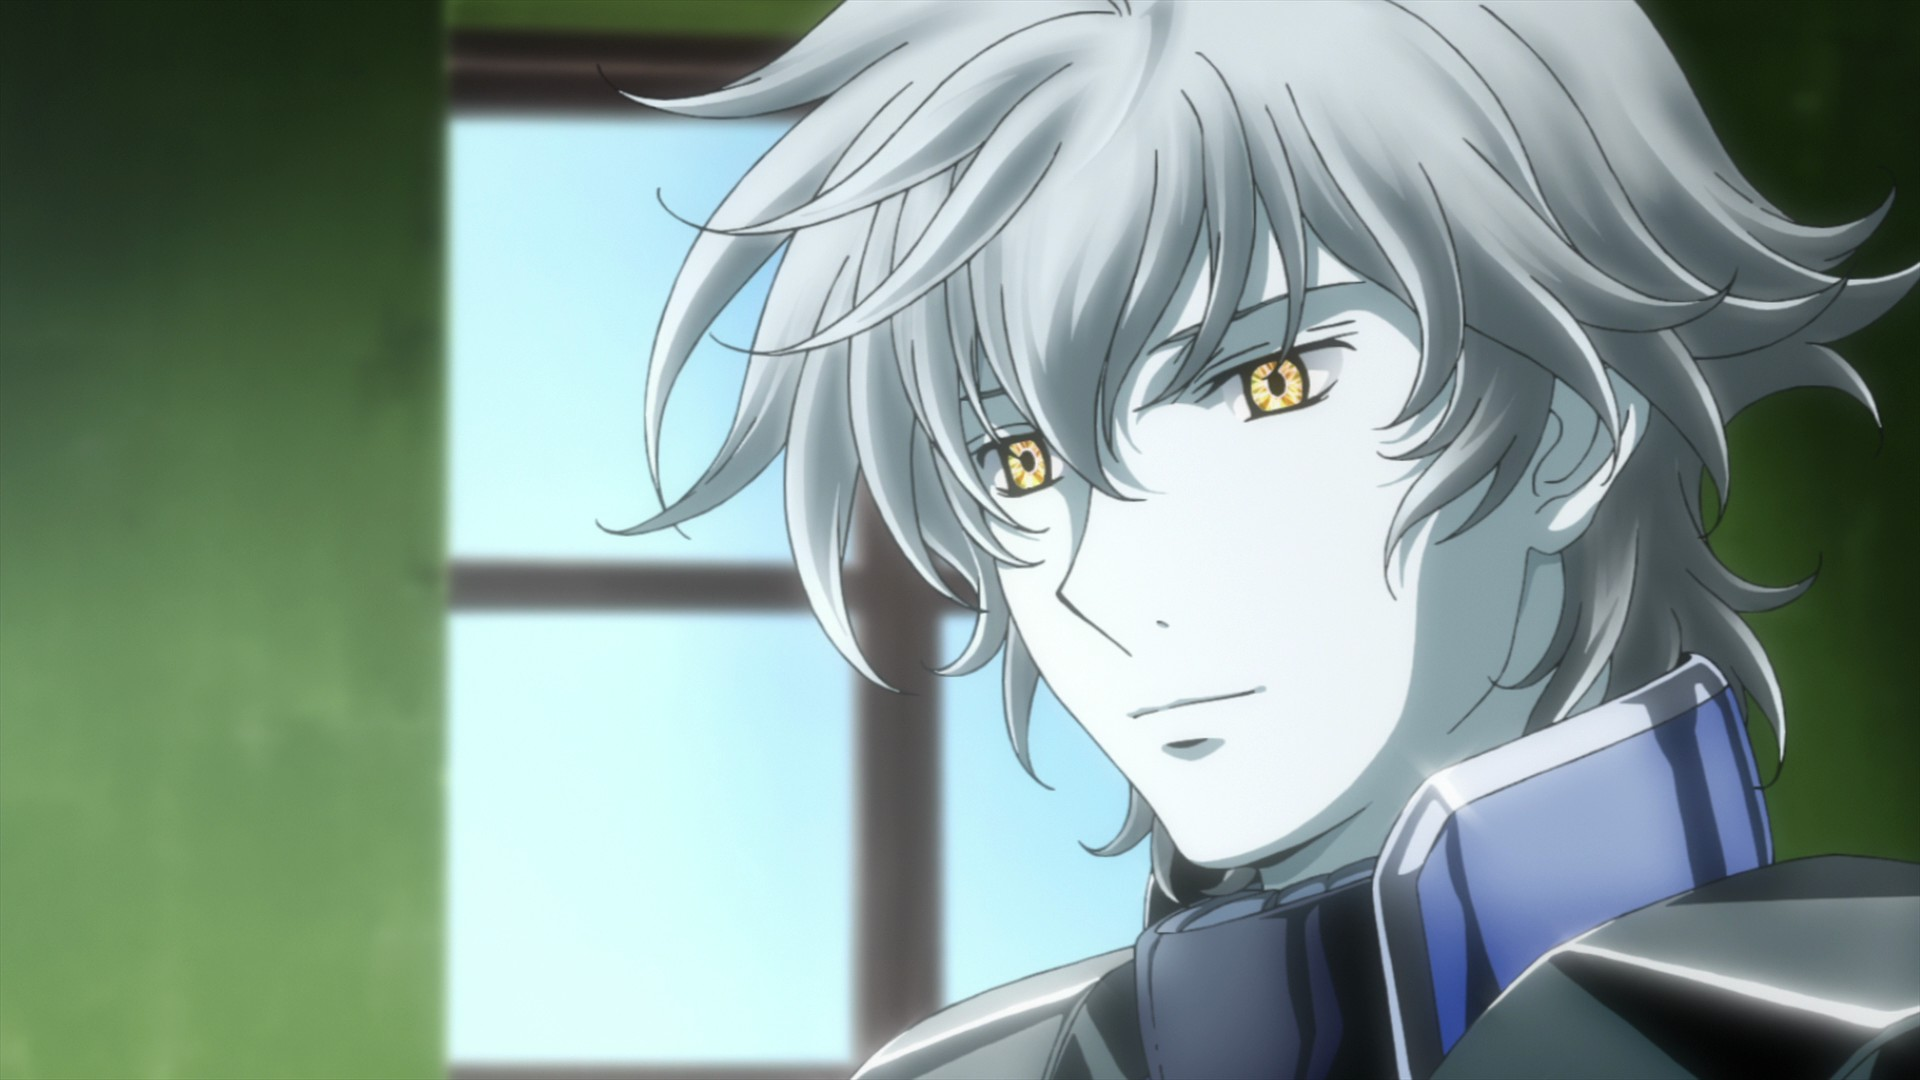 Setsuna F Seiei The Gundam Wiki Fandom